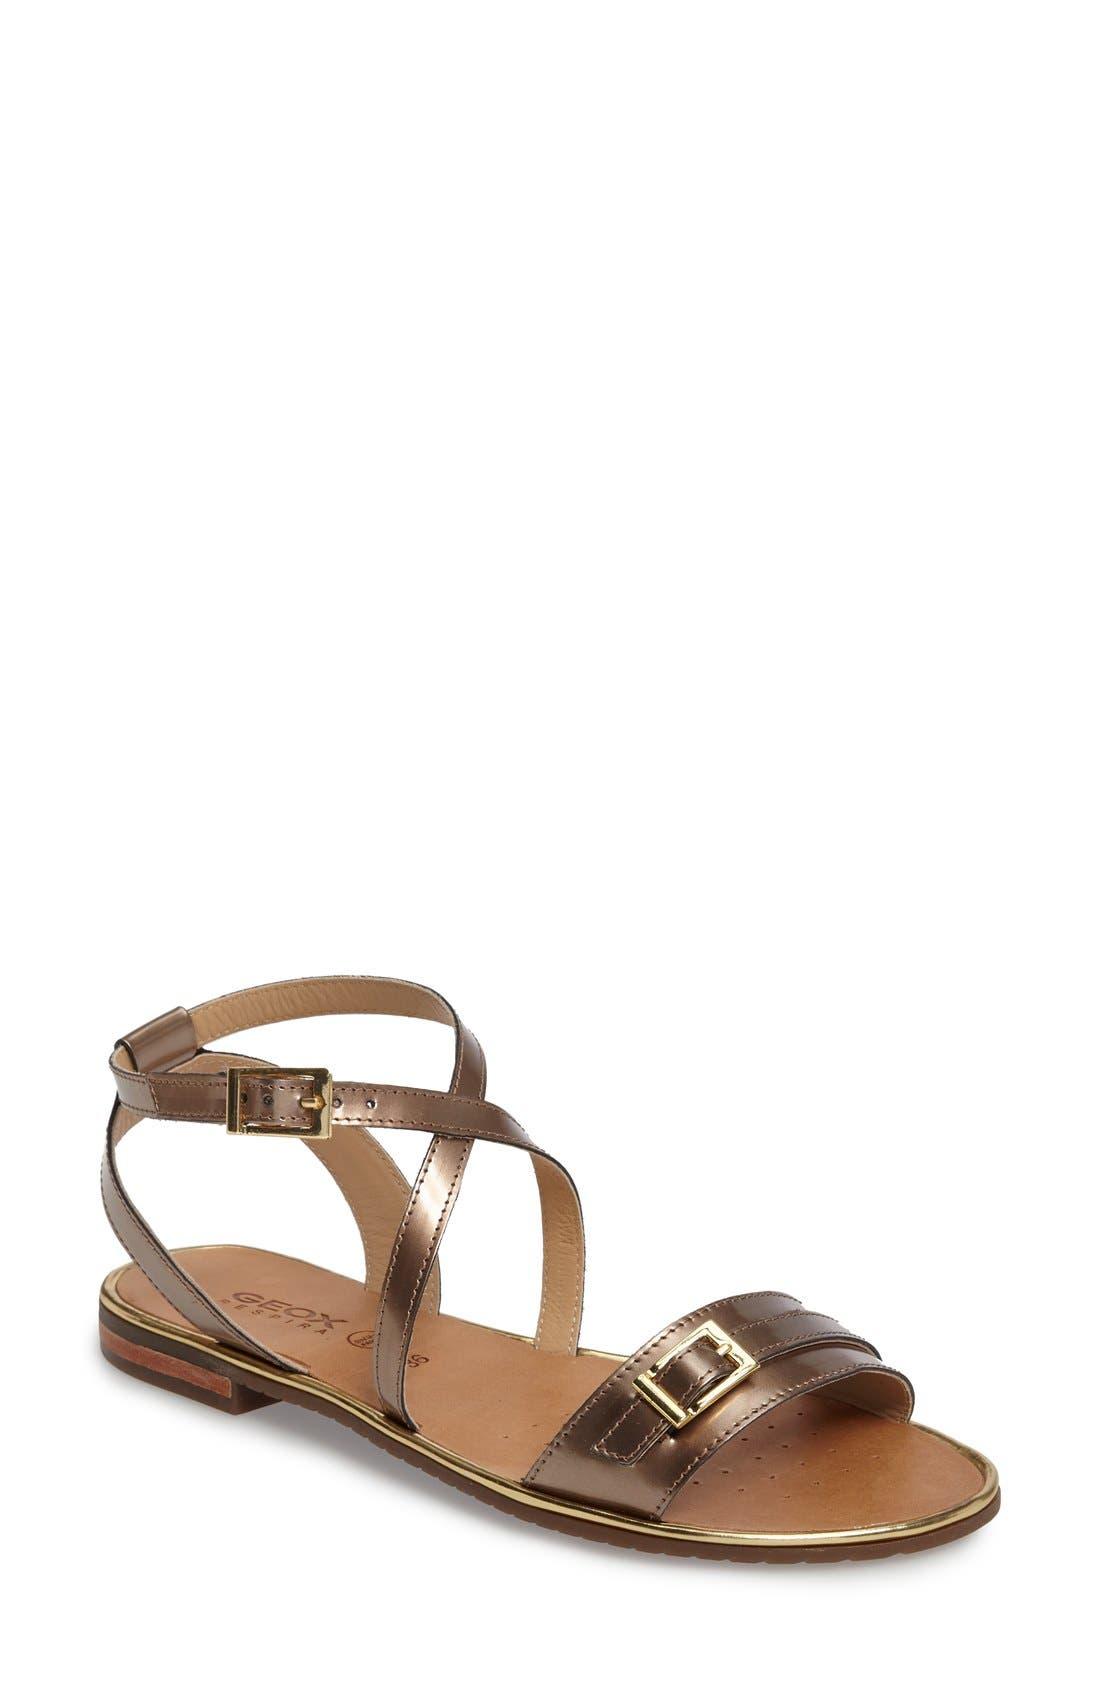 Alternate Image 1 Selected - Geox 'Sozy' Sandal (Women)